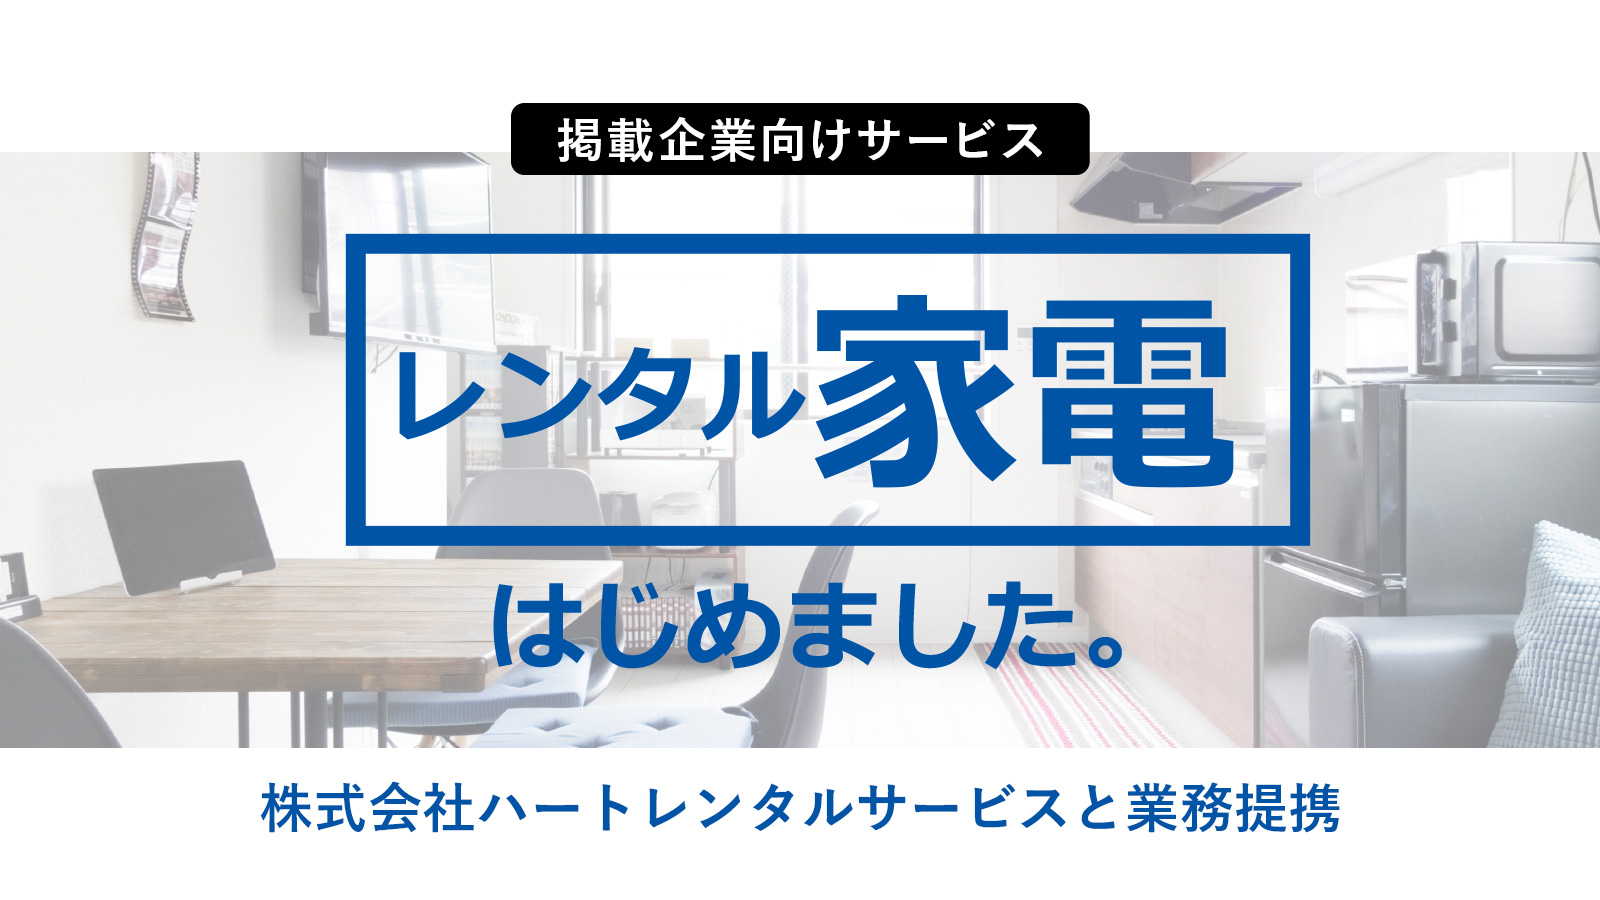 【PR】掲載会社向けにレンタル家電サービスを開始いたしました